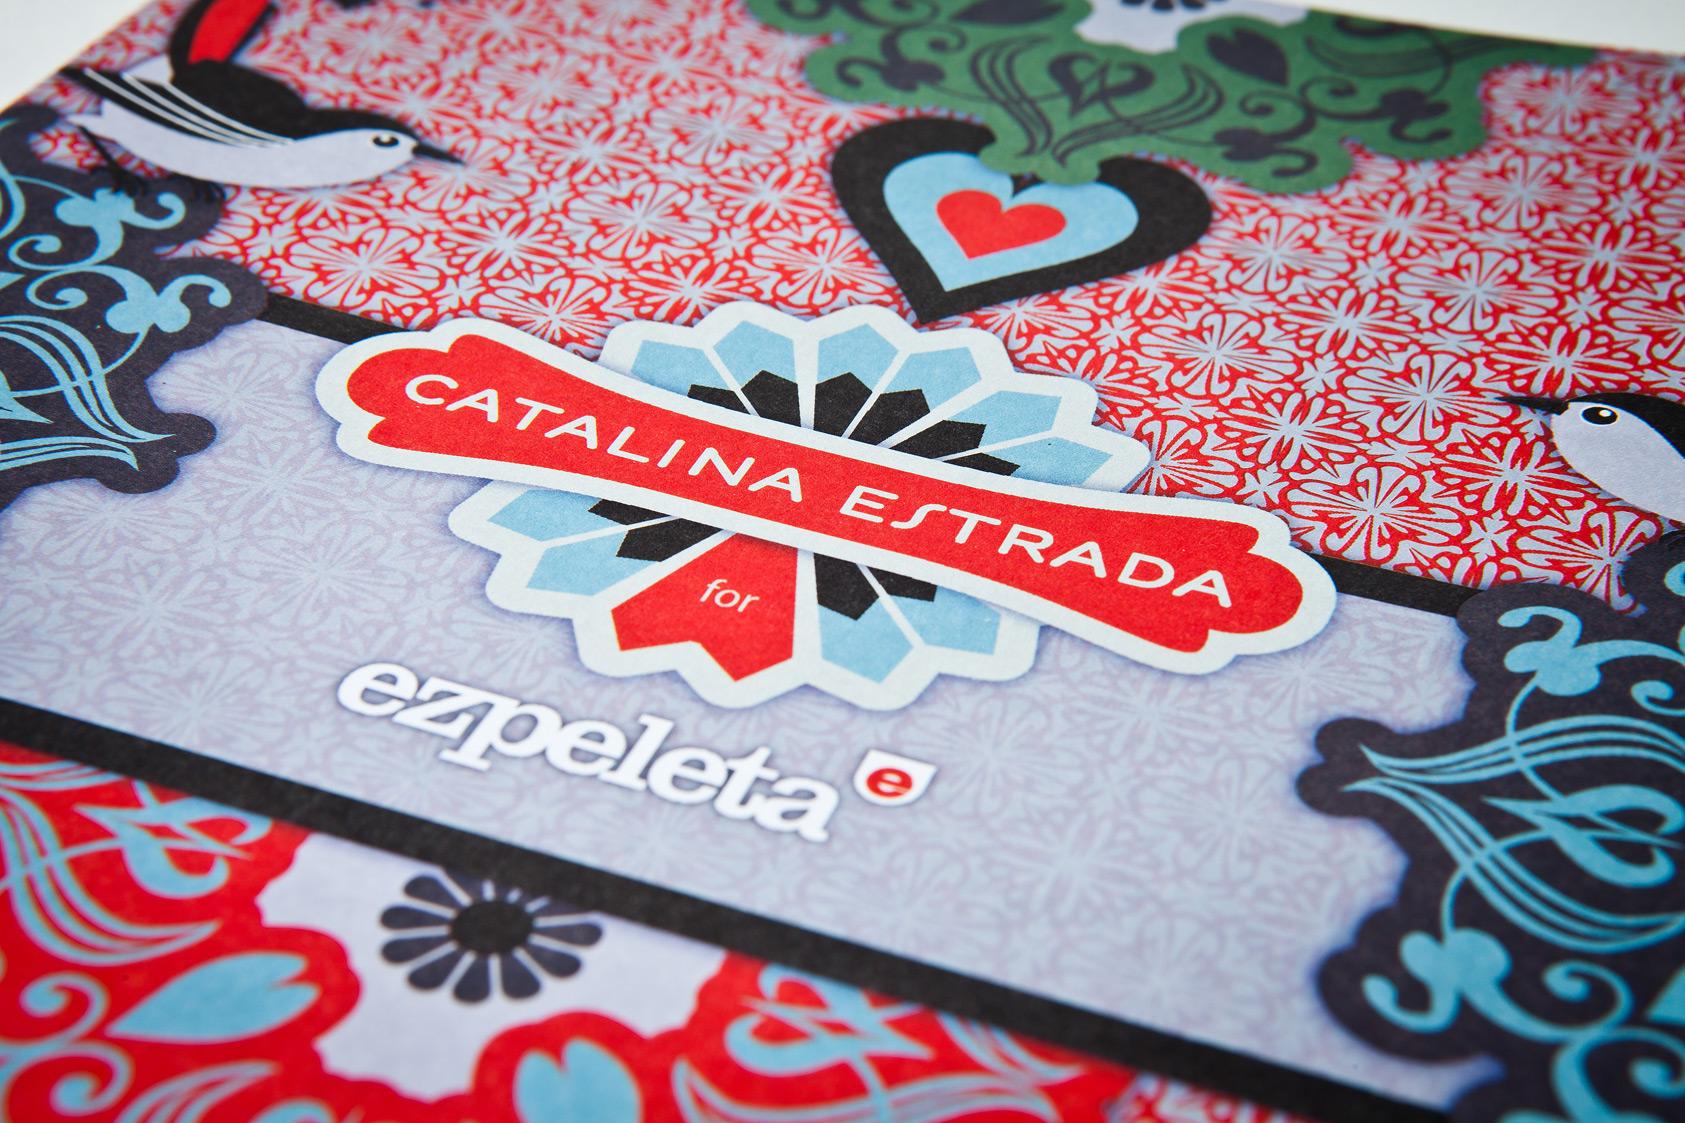 lombok_design_marketing_blog_ezpeleta_catalogos_1